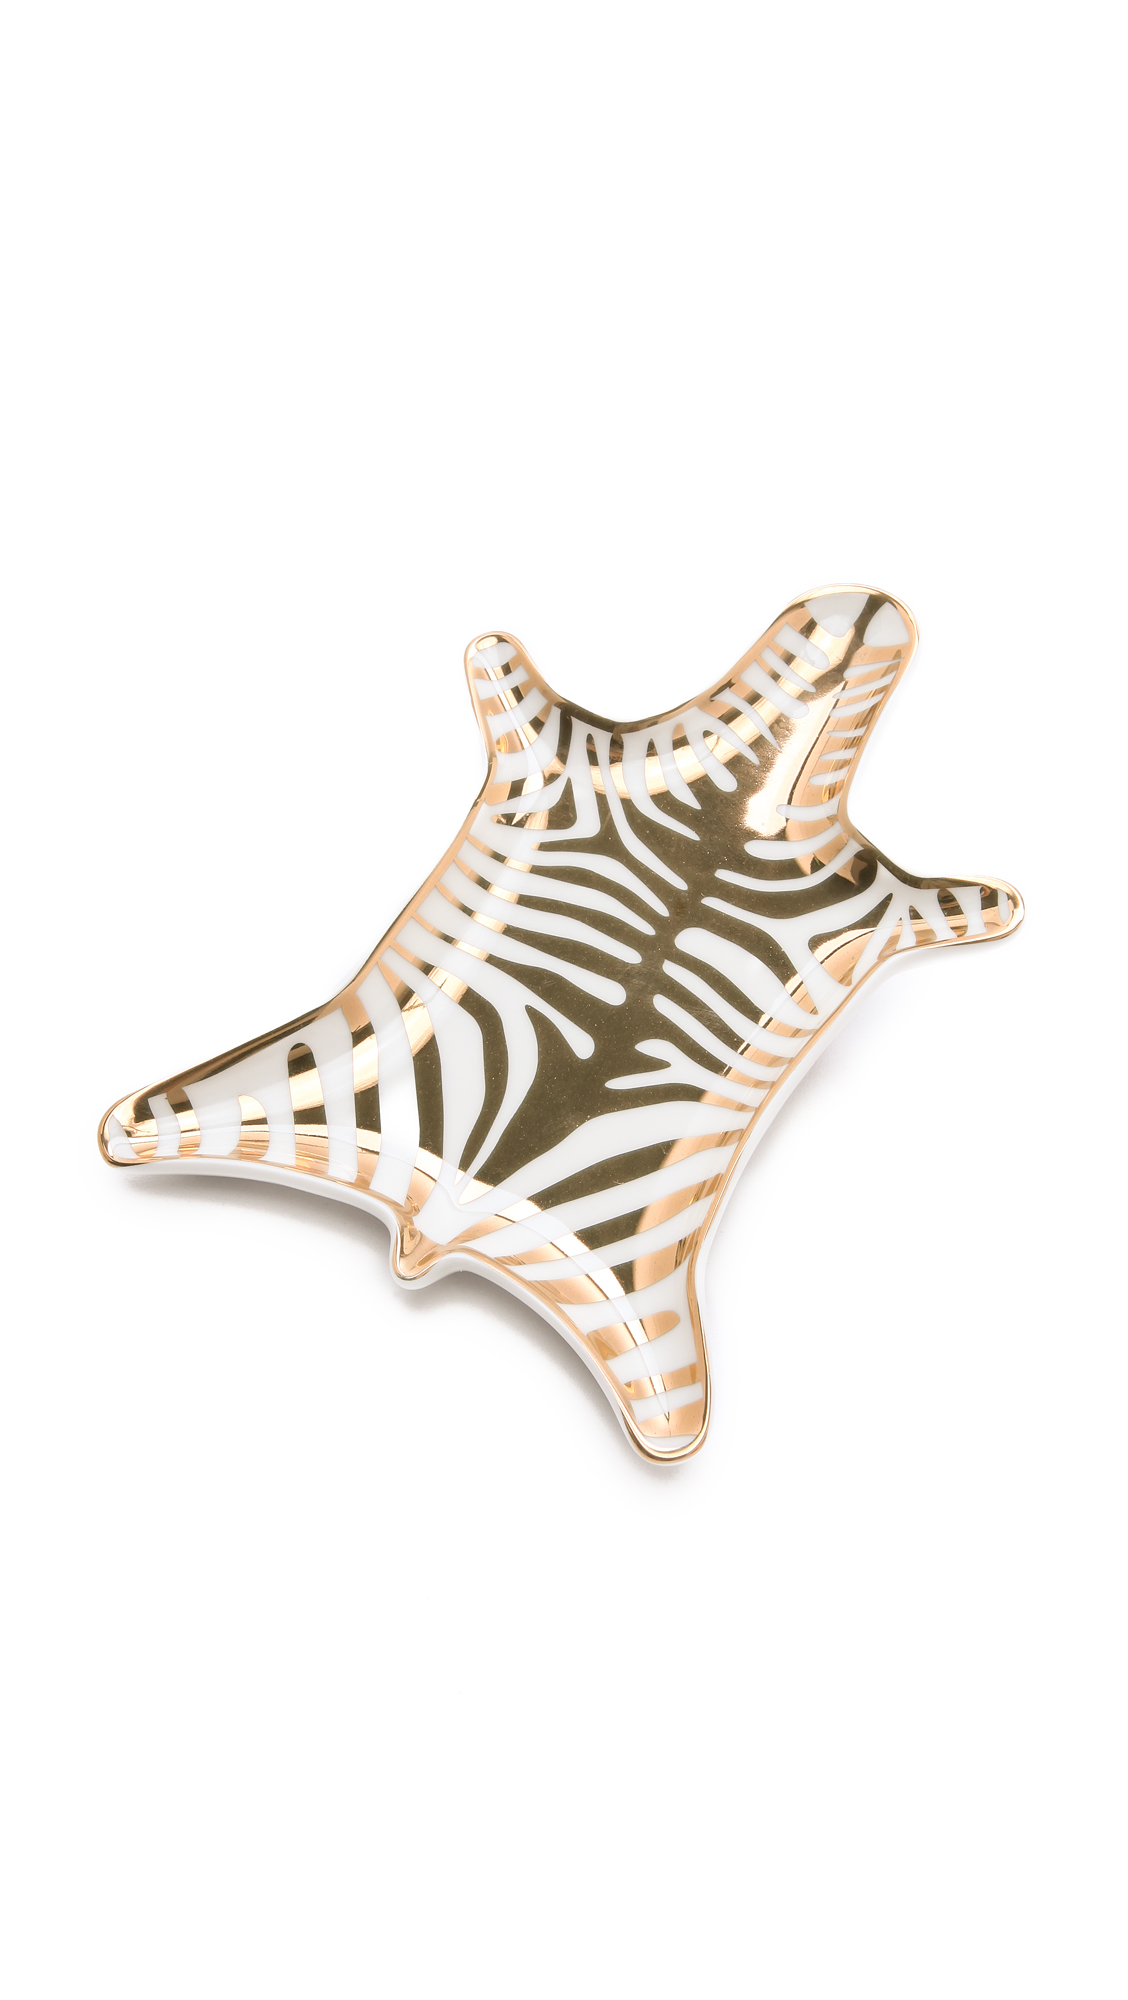 Jonathan Adler Metallic Zebra Dish - Gold